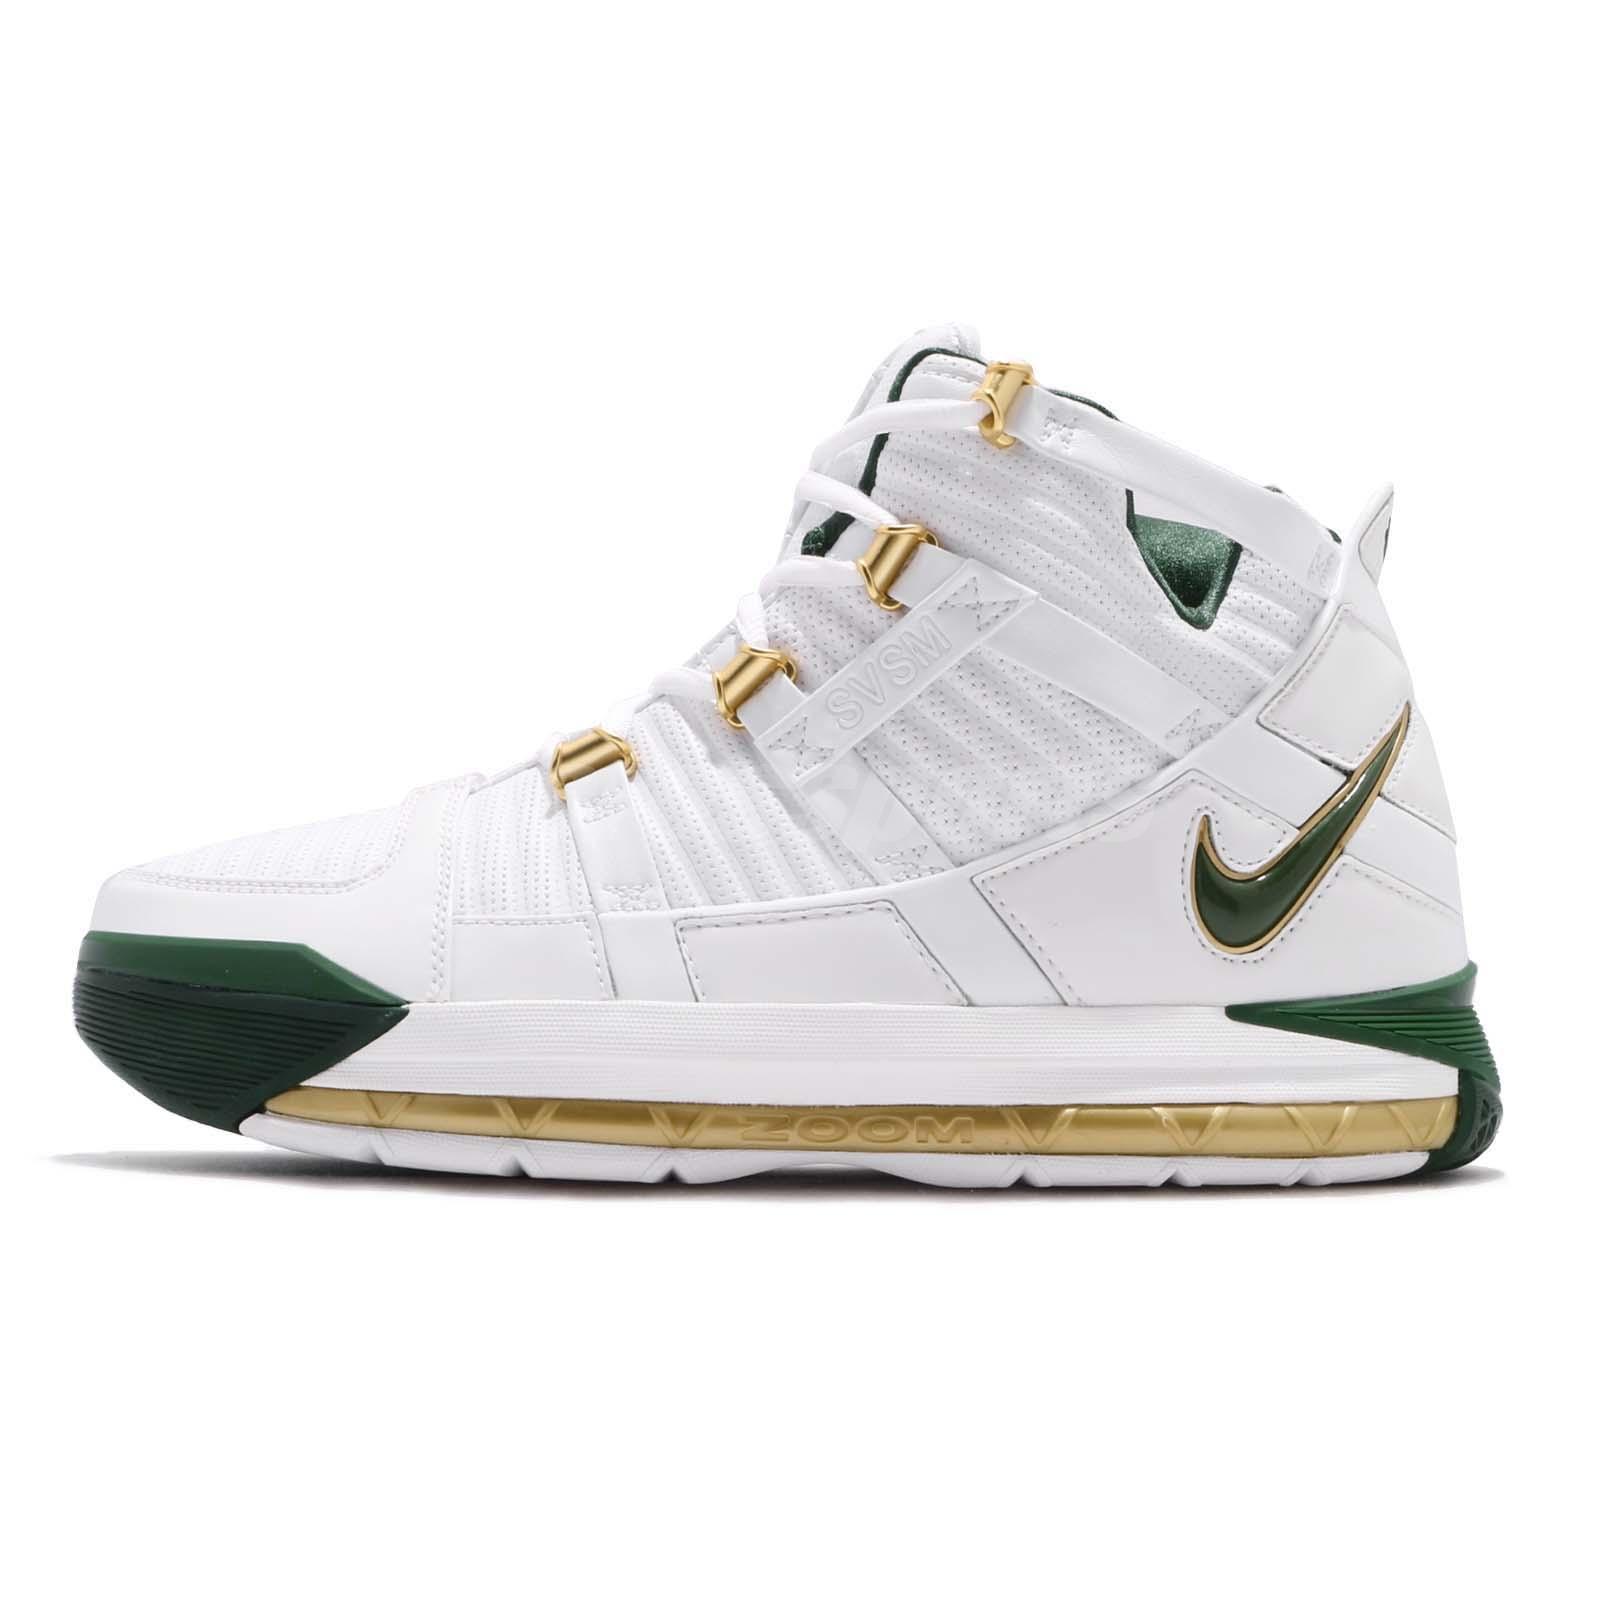 9fe0d2688f90 Nike Zoom Lebron III QS SVSM Home White Green Men Basketball Shoes  AO2434-102